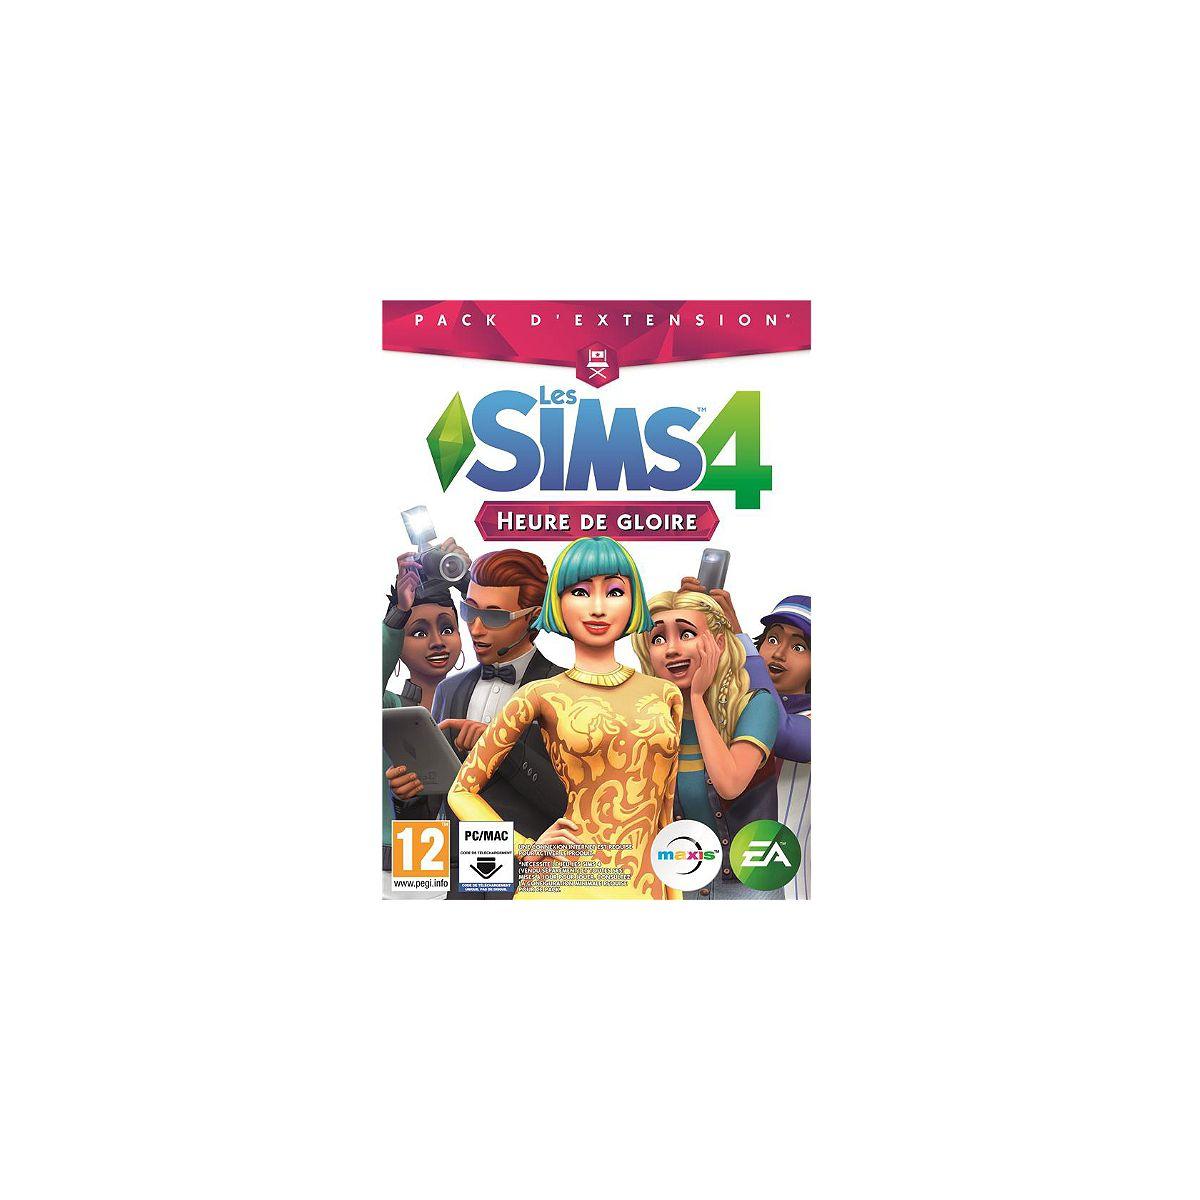 Jeu PC ELECTRONIC ARTS Sims 4 Heure de Gloire (photo)